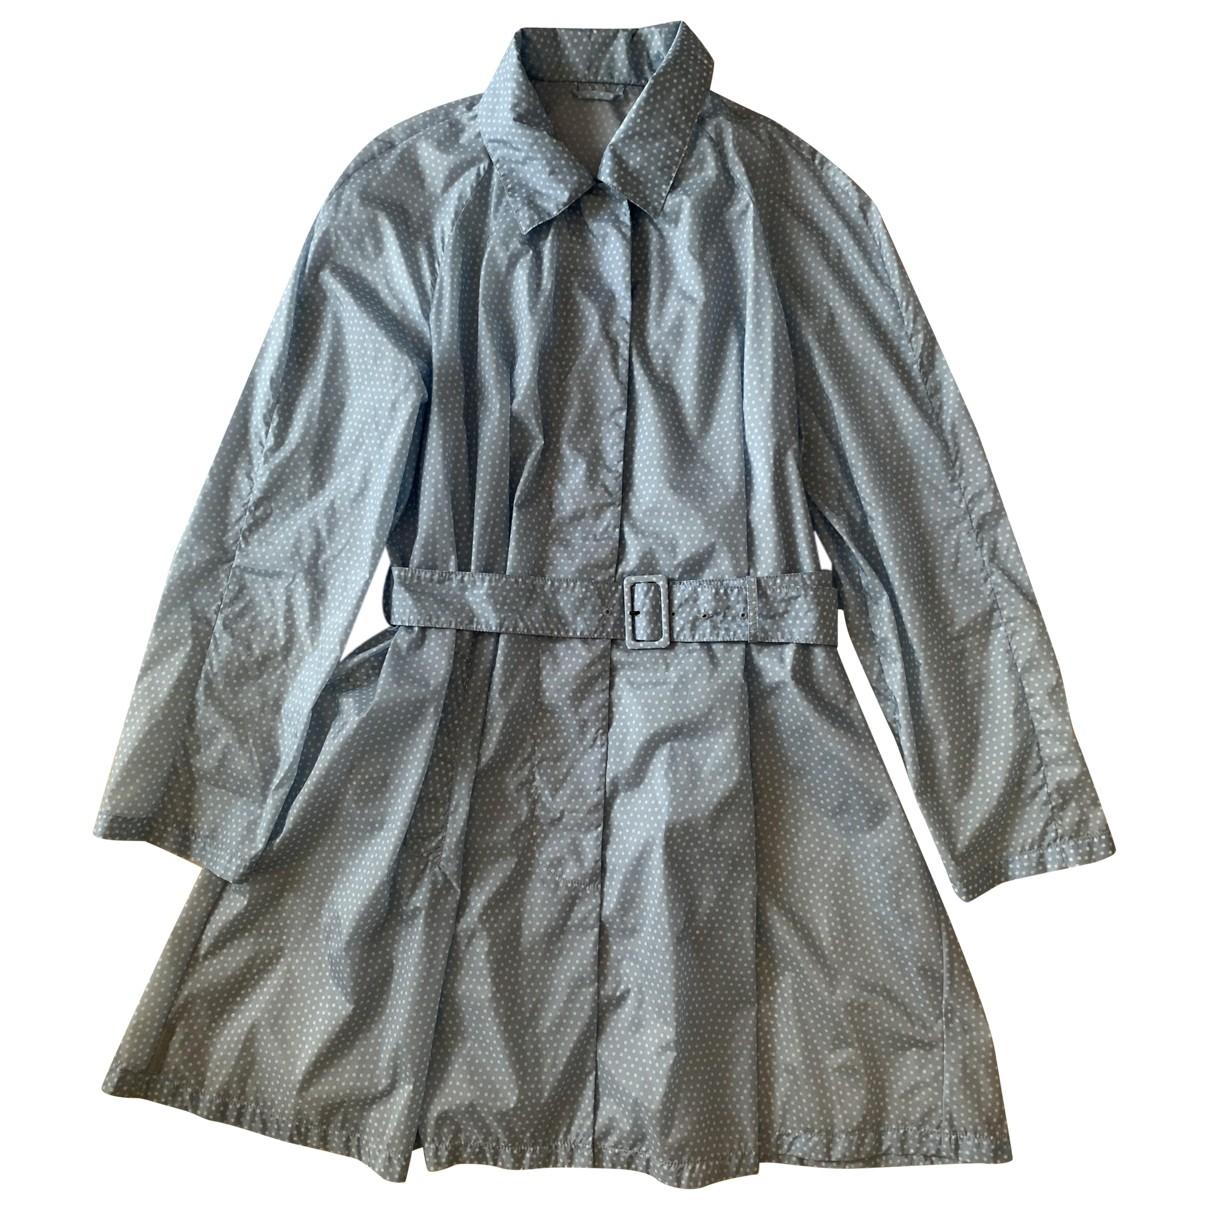 Prada \N Blue Trench coat for Women 46 IT